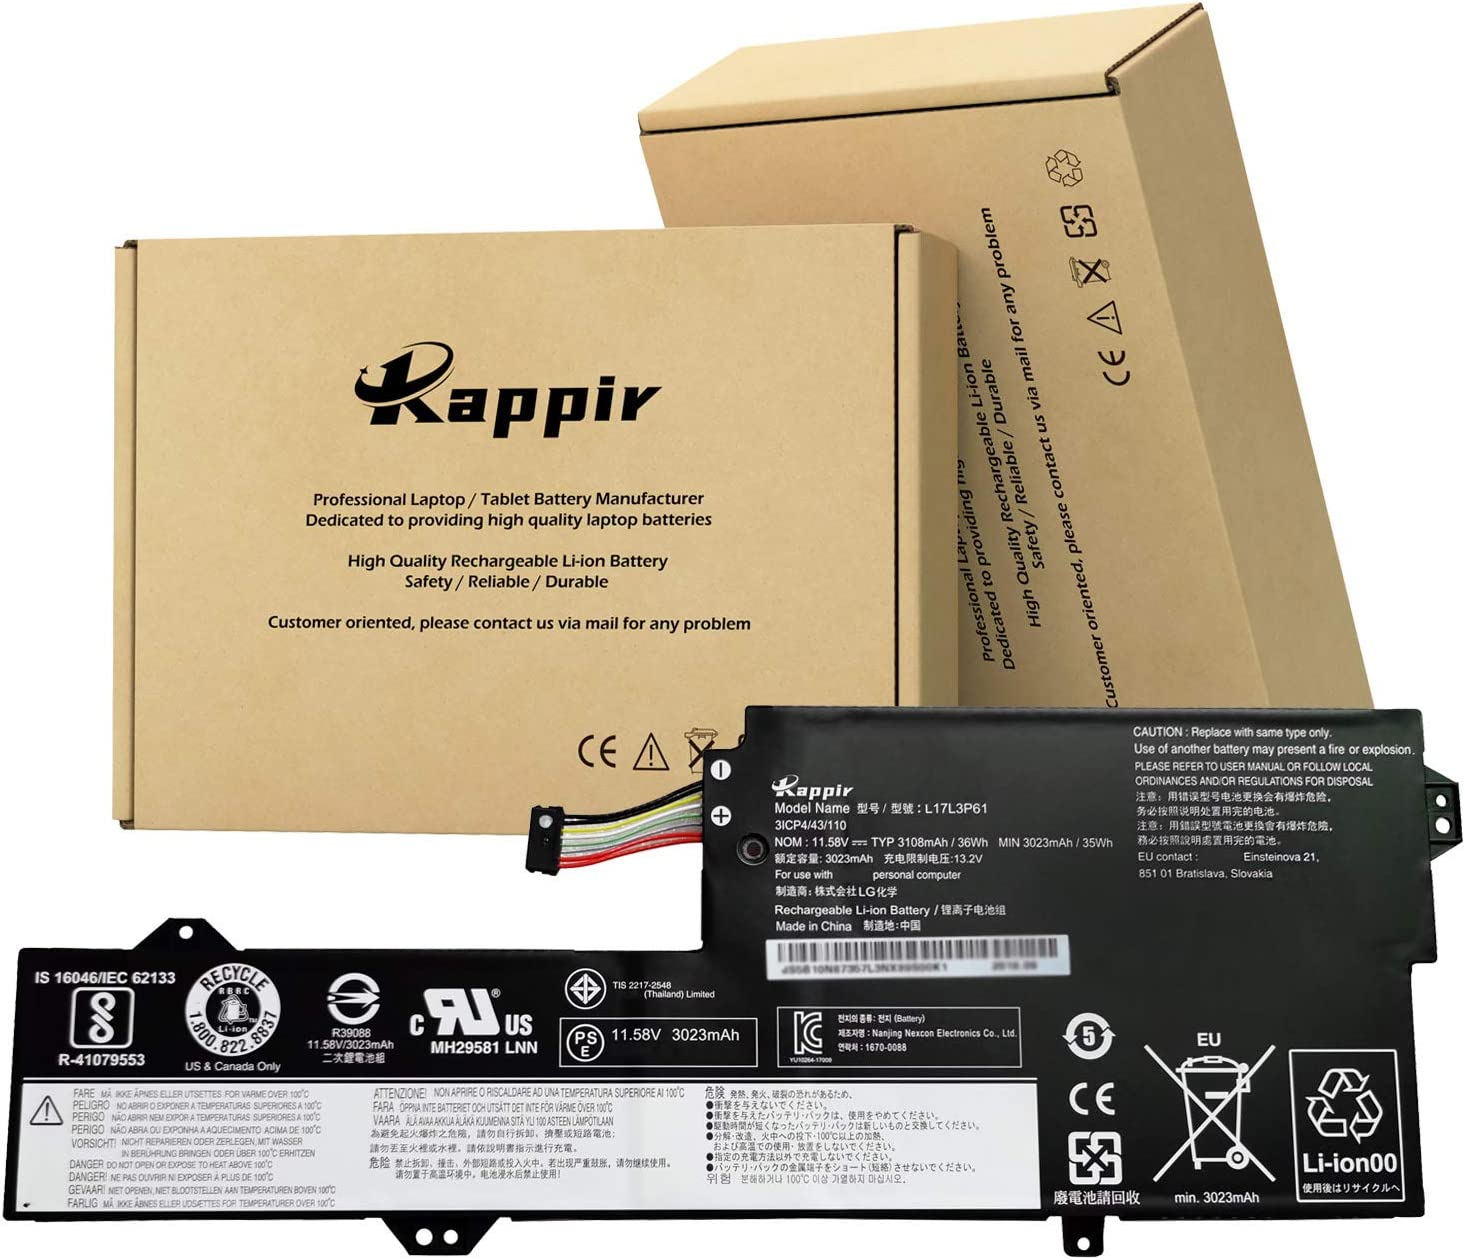 BOWEIRUI L17L3P61 (11.58V 36Wh 3108mAh) Laptop Battery Replacement for Lenovo IdeaPad Yoga 720-12IKB Yoga 520-12 320-11 320S-13IKB Xiaoxin 7000-13 Series L17C3P61 L17M3P61 (Type A)